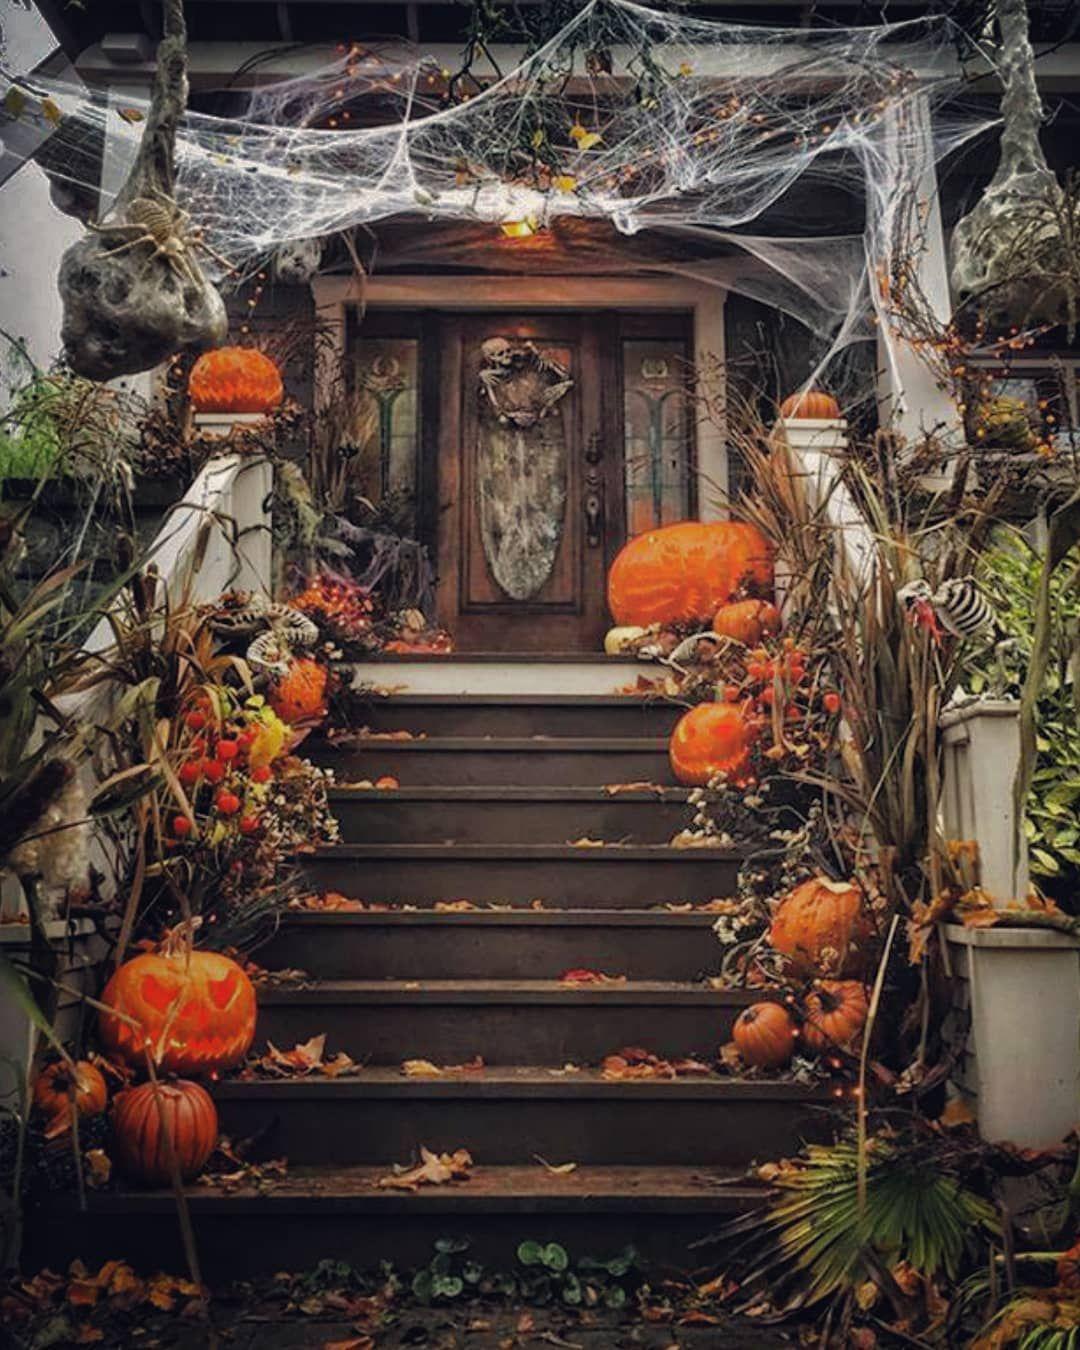 Beni Mckenzie On Instagram Beni Mckenzie Halloween Dreamy